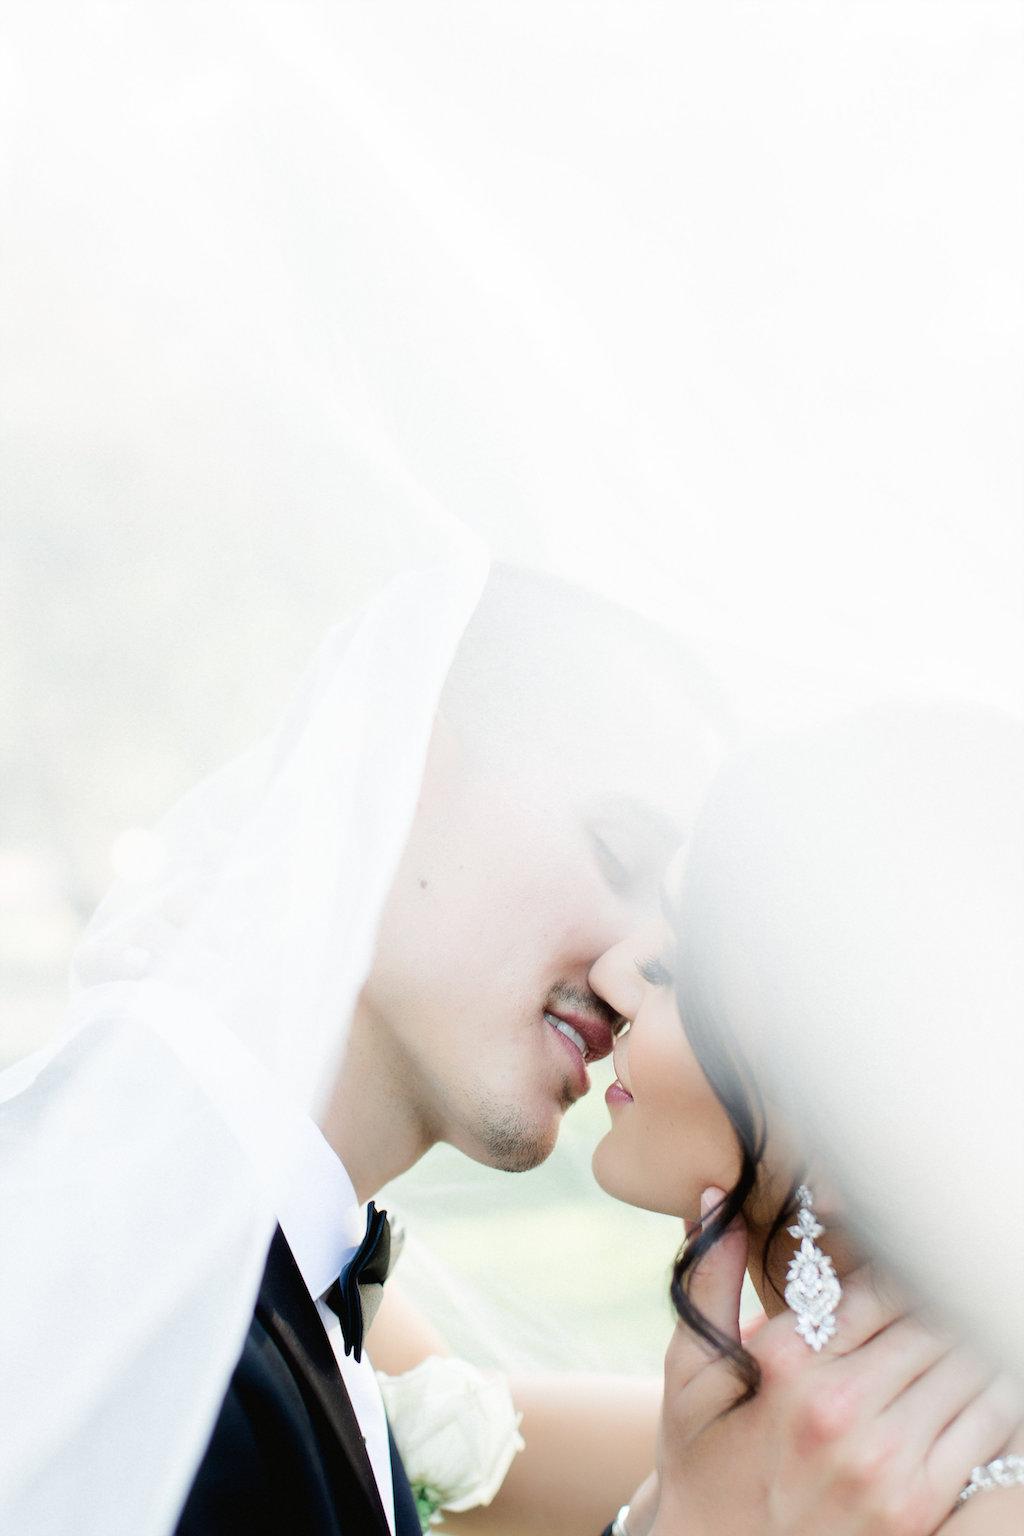 Creative Bride and Groom Wedding Portrait Under Veil   St. Petersburg Photographer Ailyn La Torre